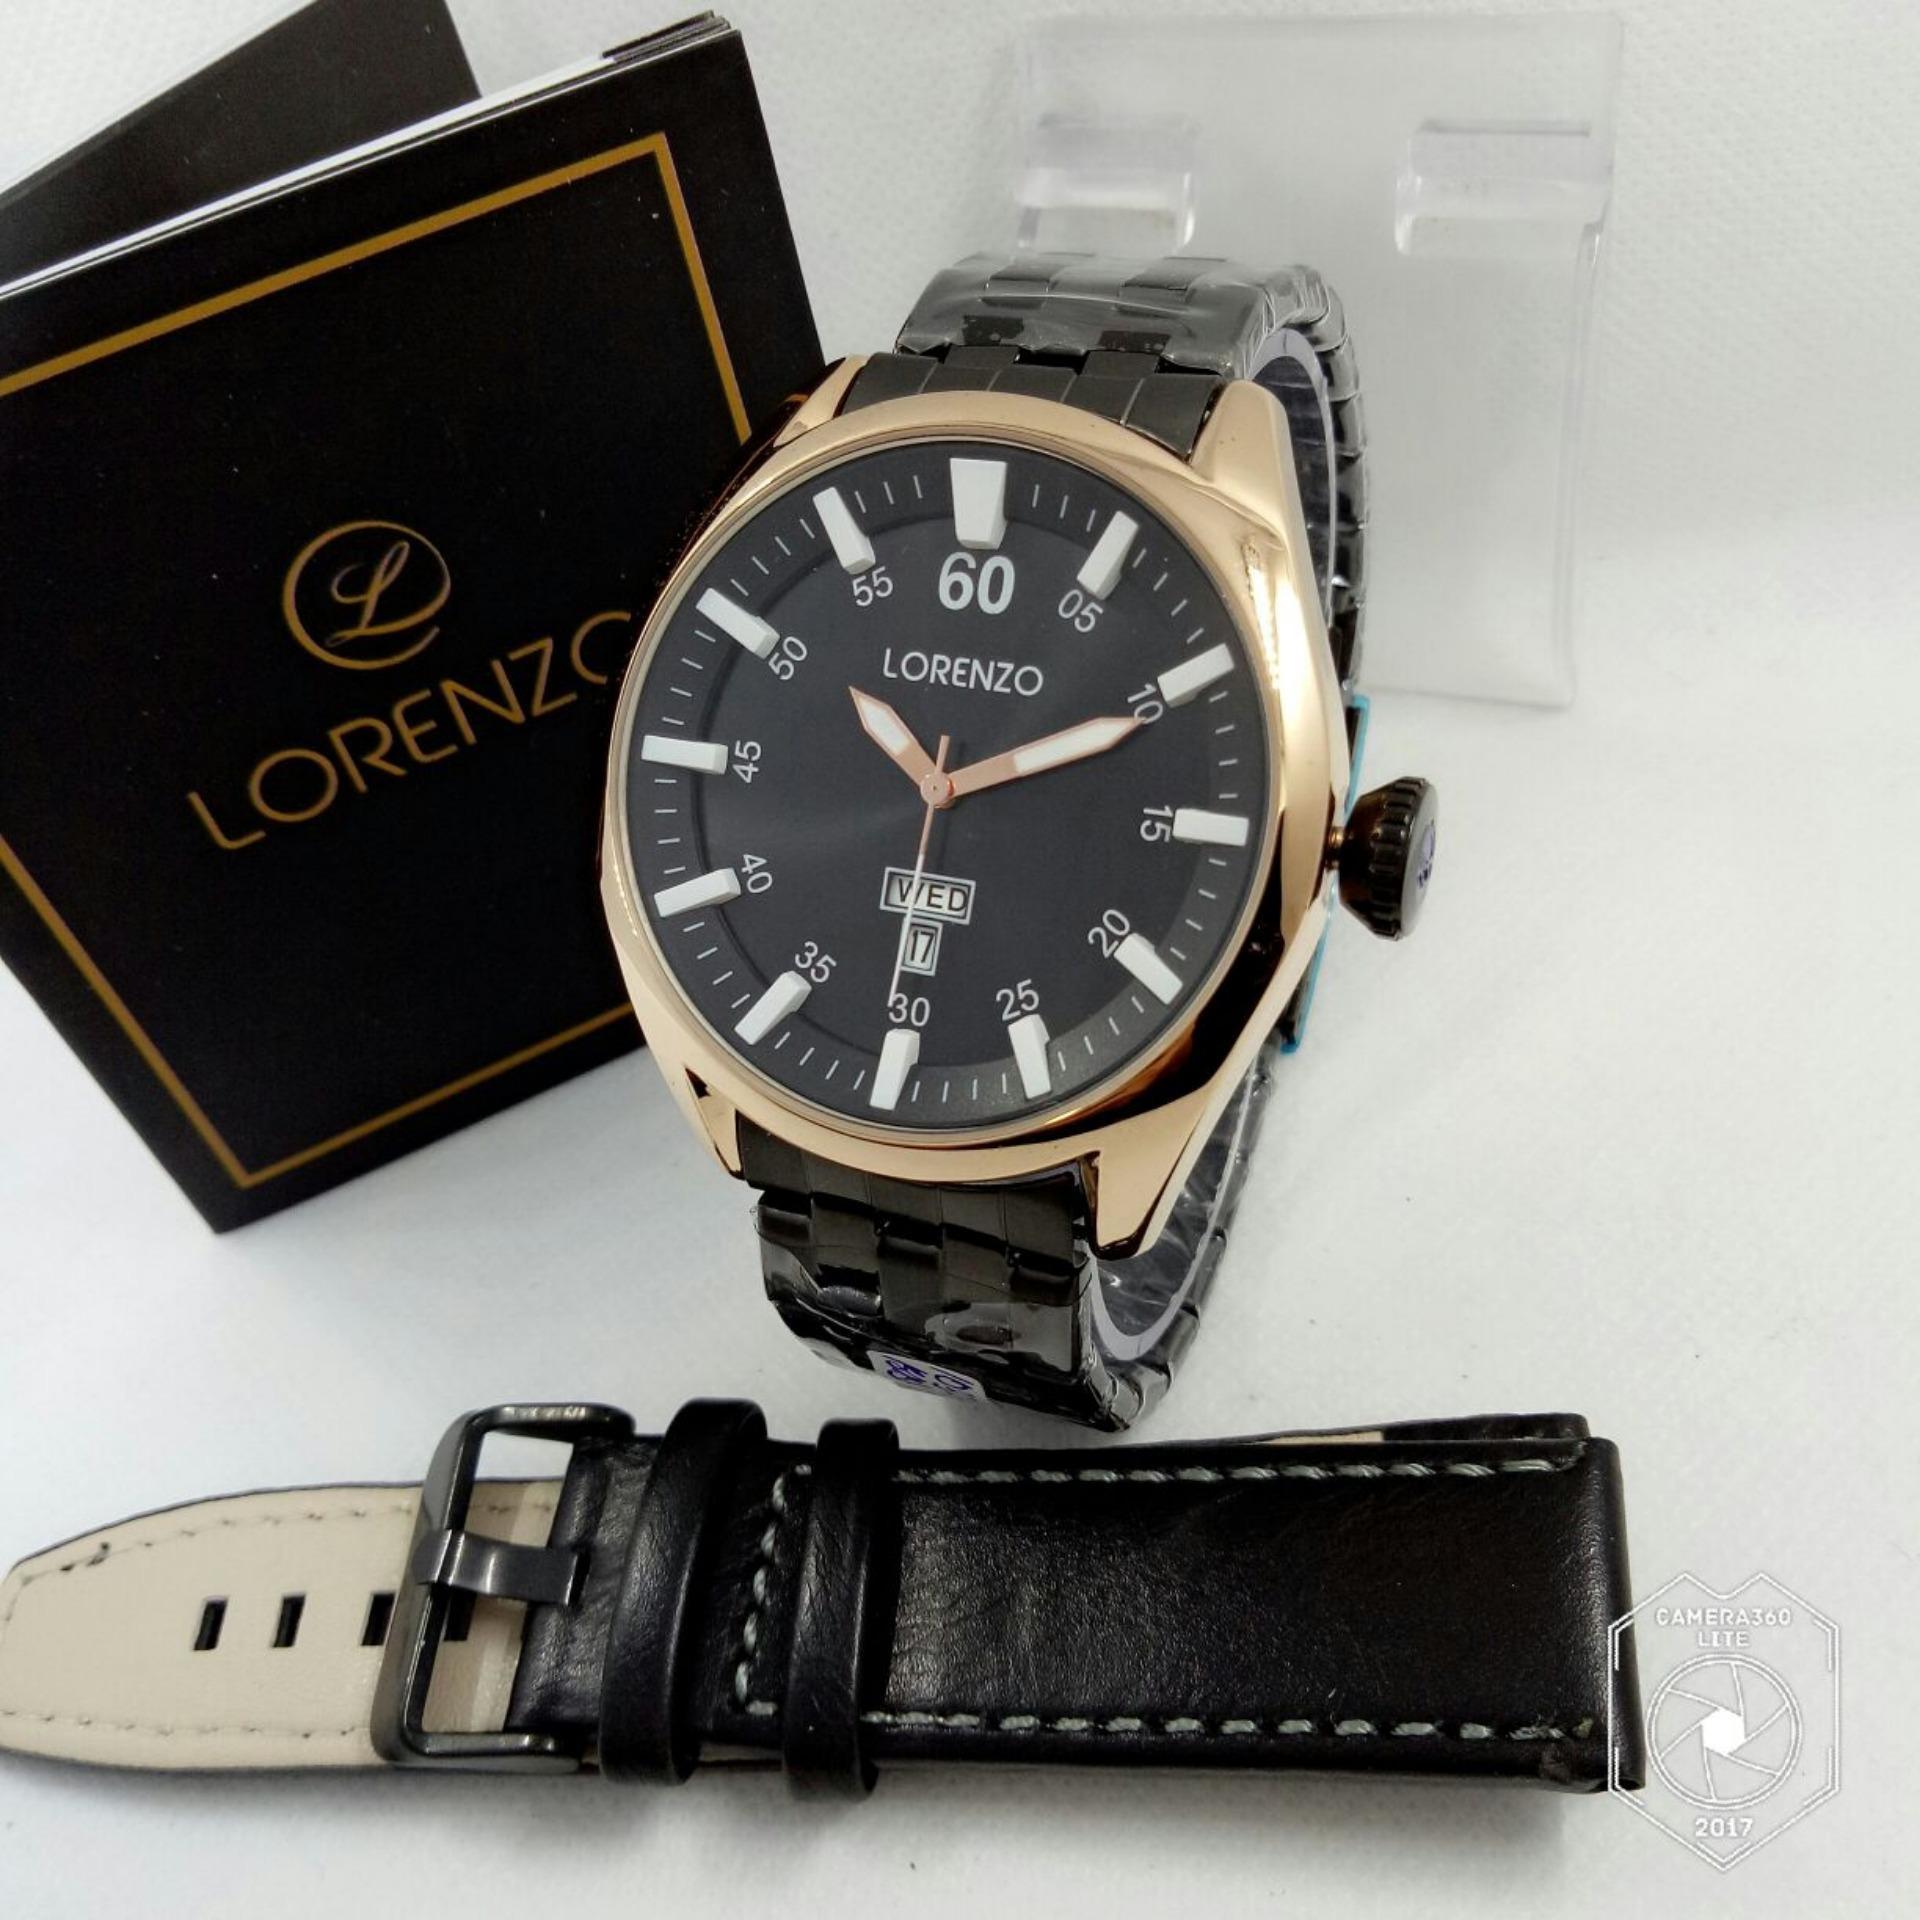 Lorenzo Original LZ1032GZ - Jam Tangan Pria - Stainless Strap + Free Gift 1 Pc Tali